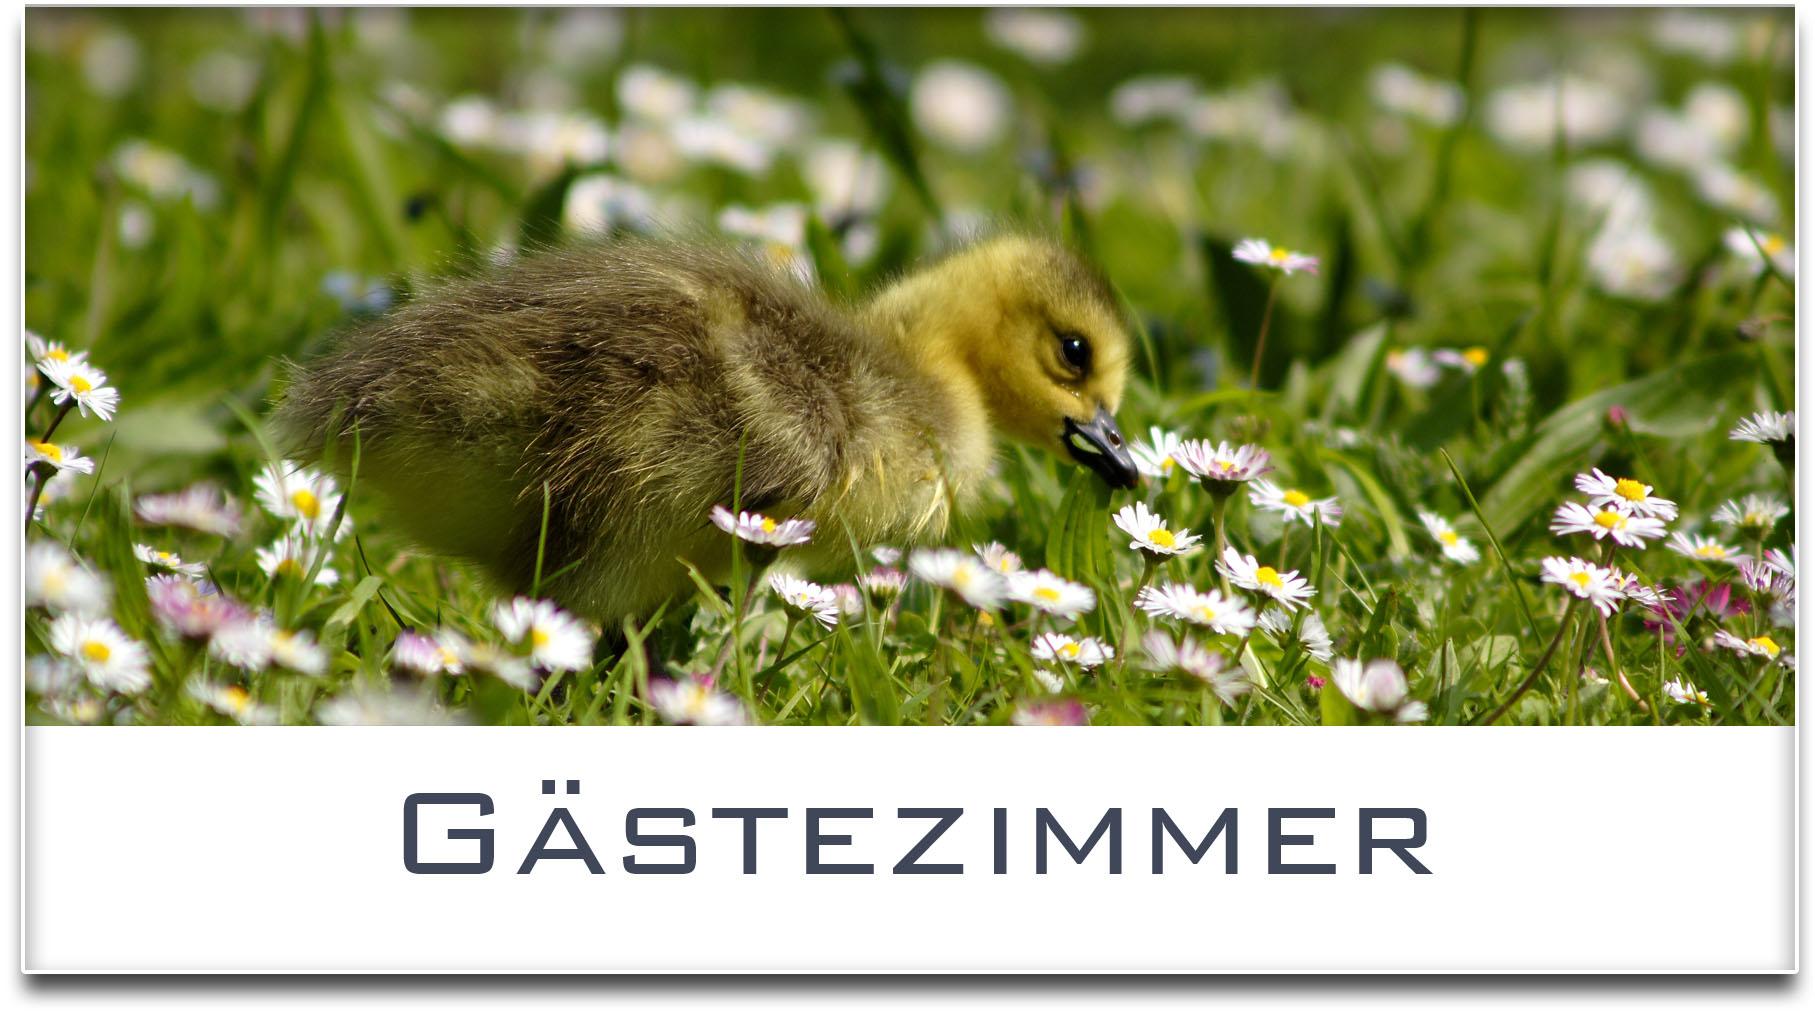 Türschild / Haustürschild / Entenküken / Gästezimmer / Selbstklebend